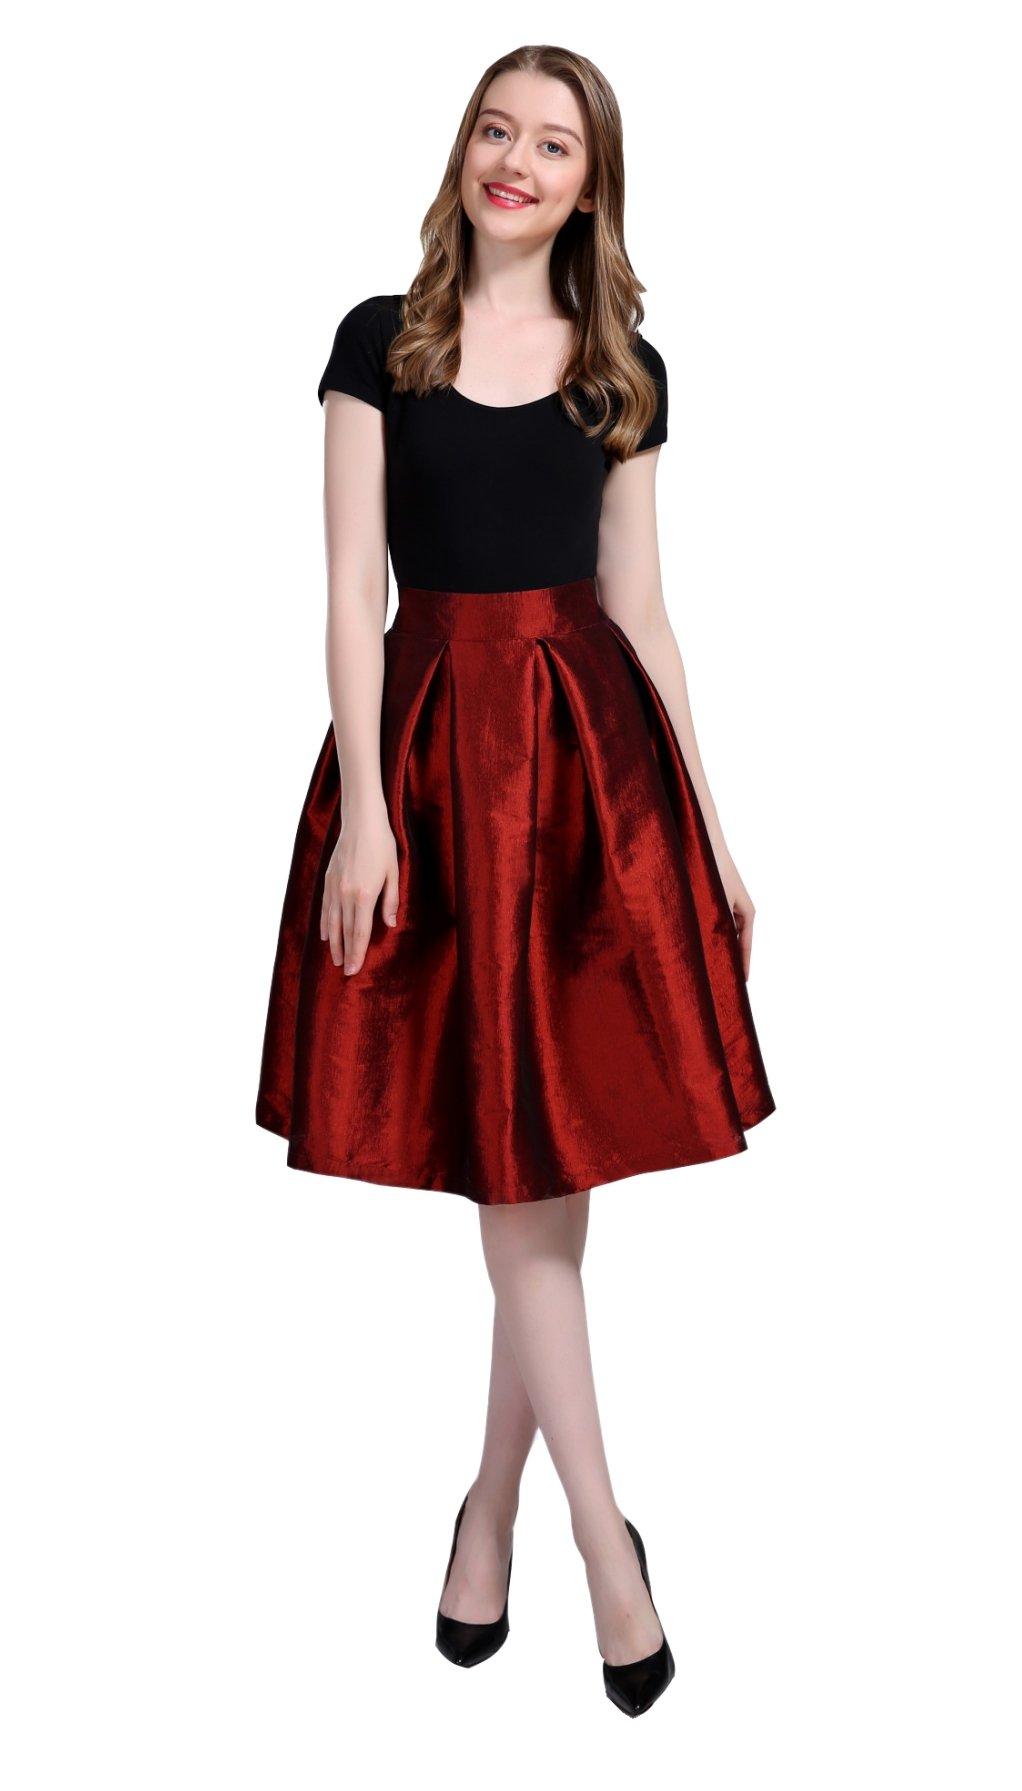 Irenwedding Women's High Waist Basic Hand Pockets Stretchy Pleated Skirt Midi Skirt Short Red XL